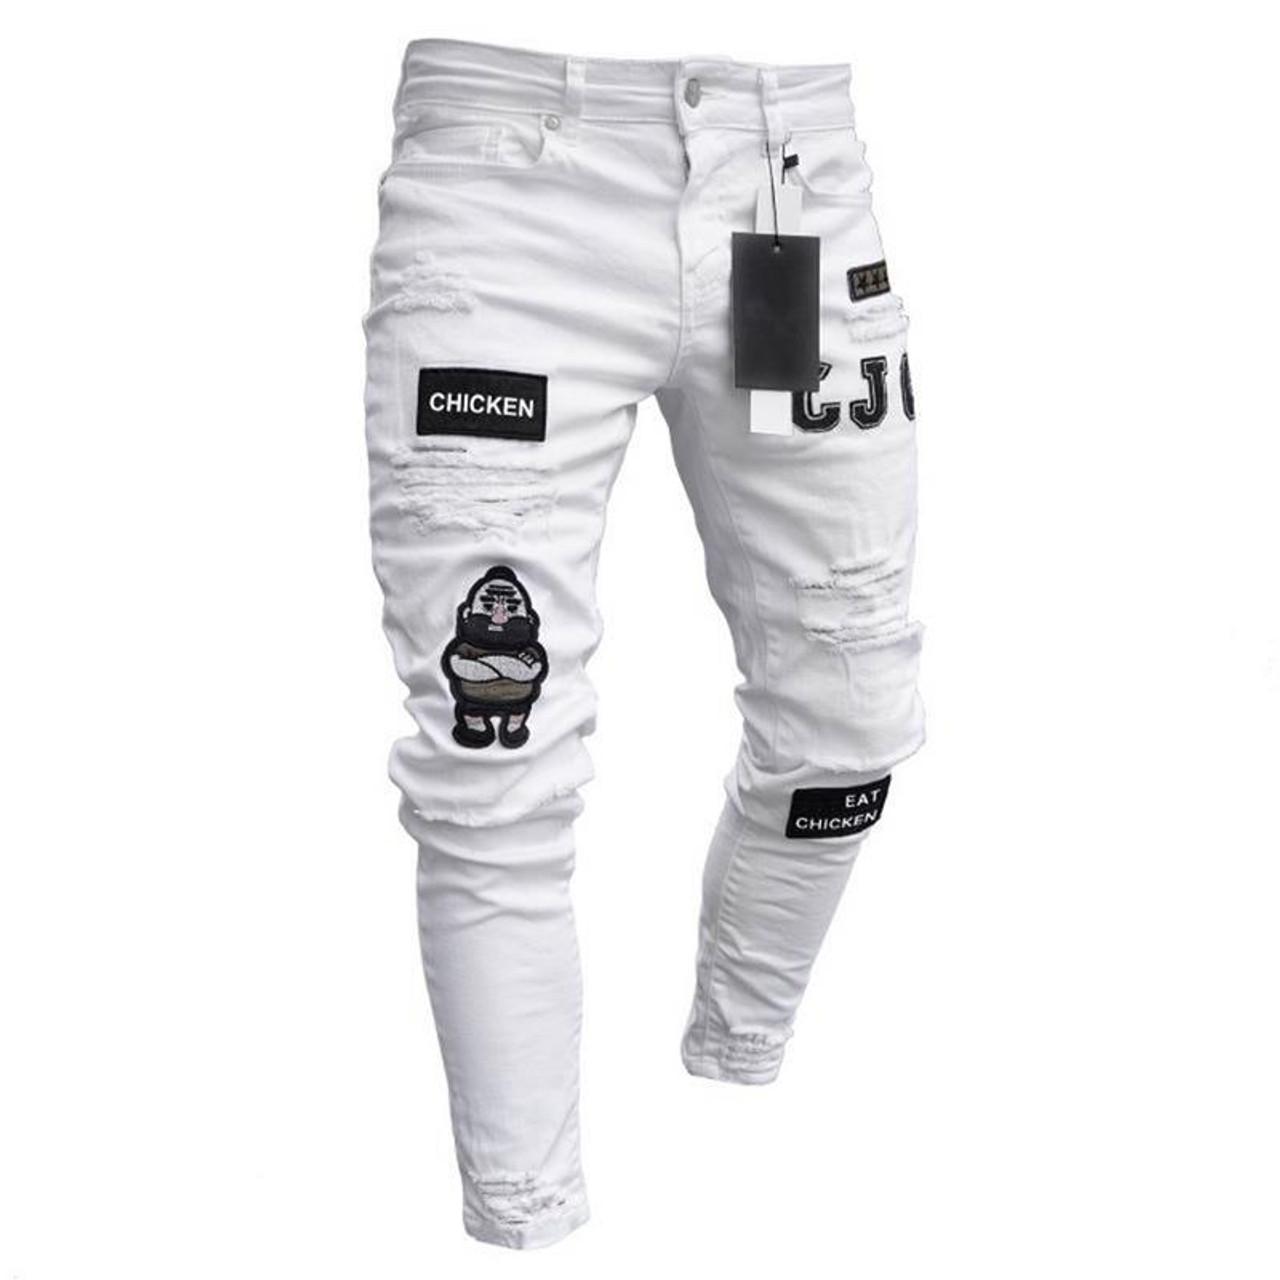 9aa0d4e6f ... Fear Of Gold Fashion Men Jeans Hip Hop Cool Streetwear Biker Patch Hole  Ripped Skinny Jeans ...